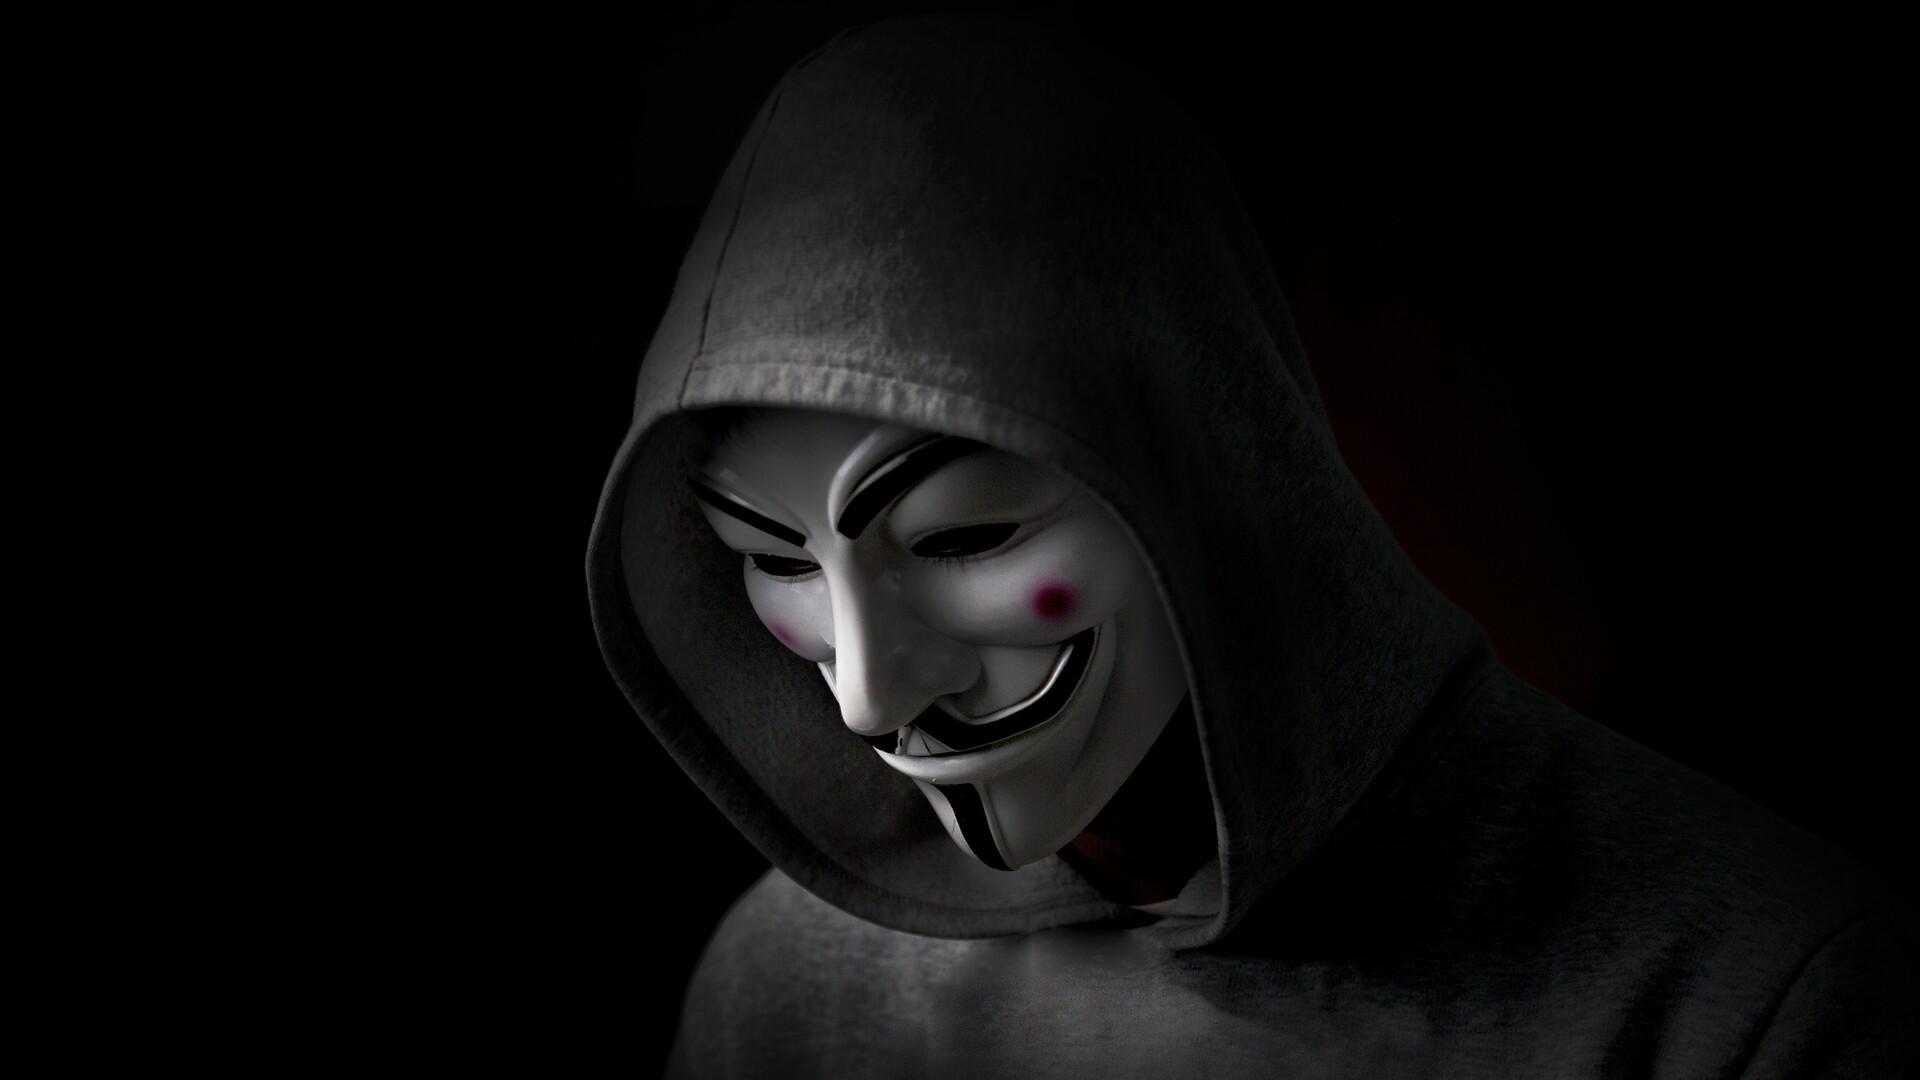 1920x1080 Anonymus Hacker In Hoodie Laptop Full Hd 1080p Hd